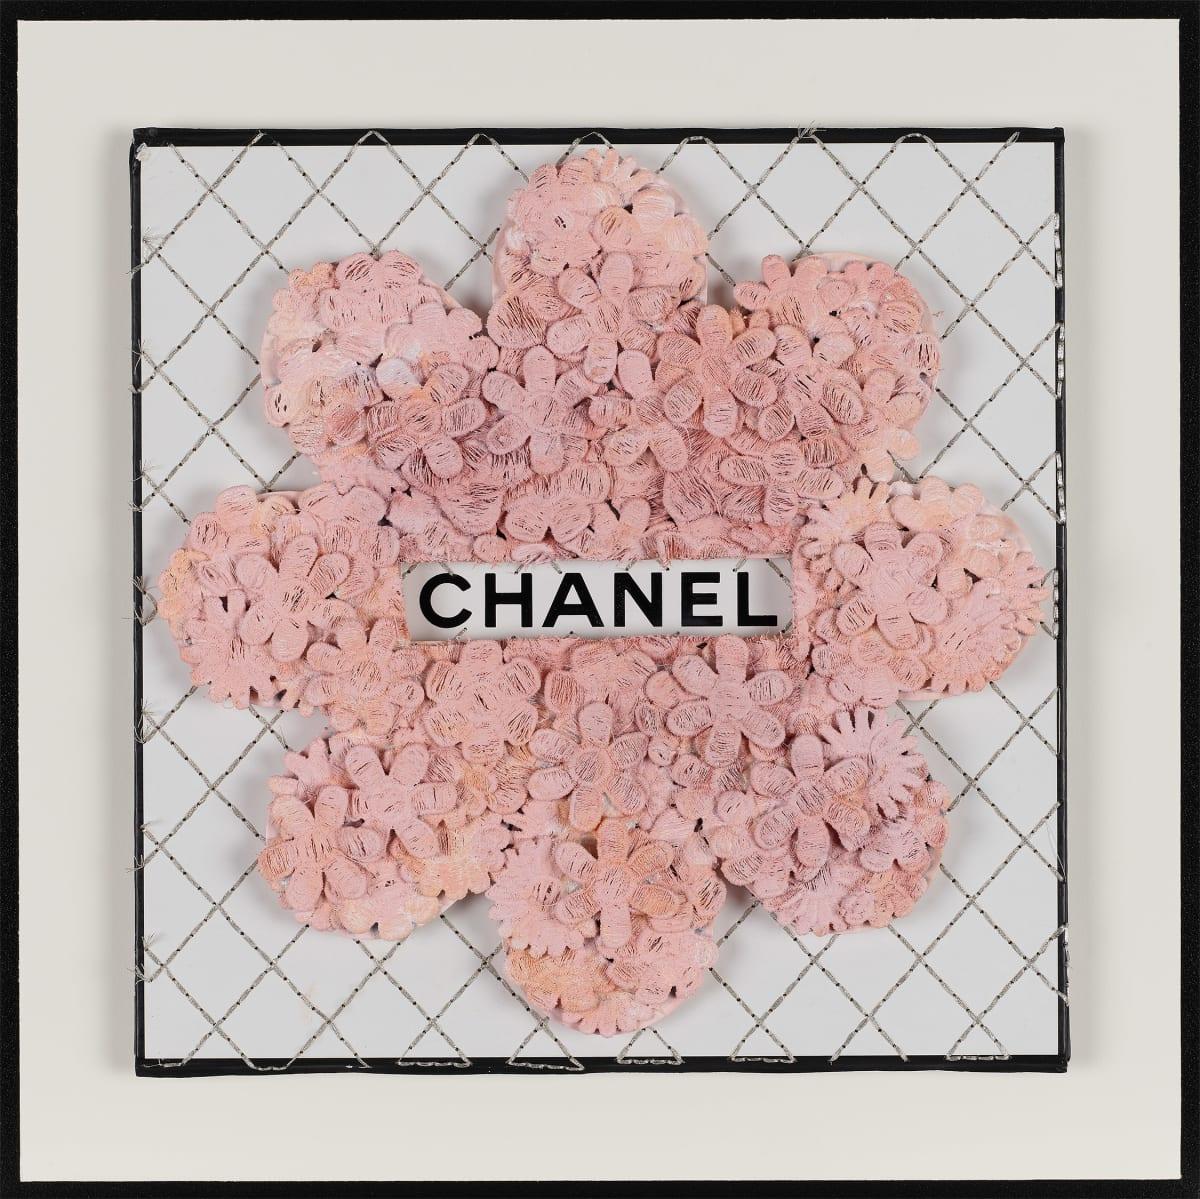 Stephen Wilson, Chanel Flower Flower, Blush, 2019